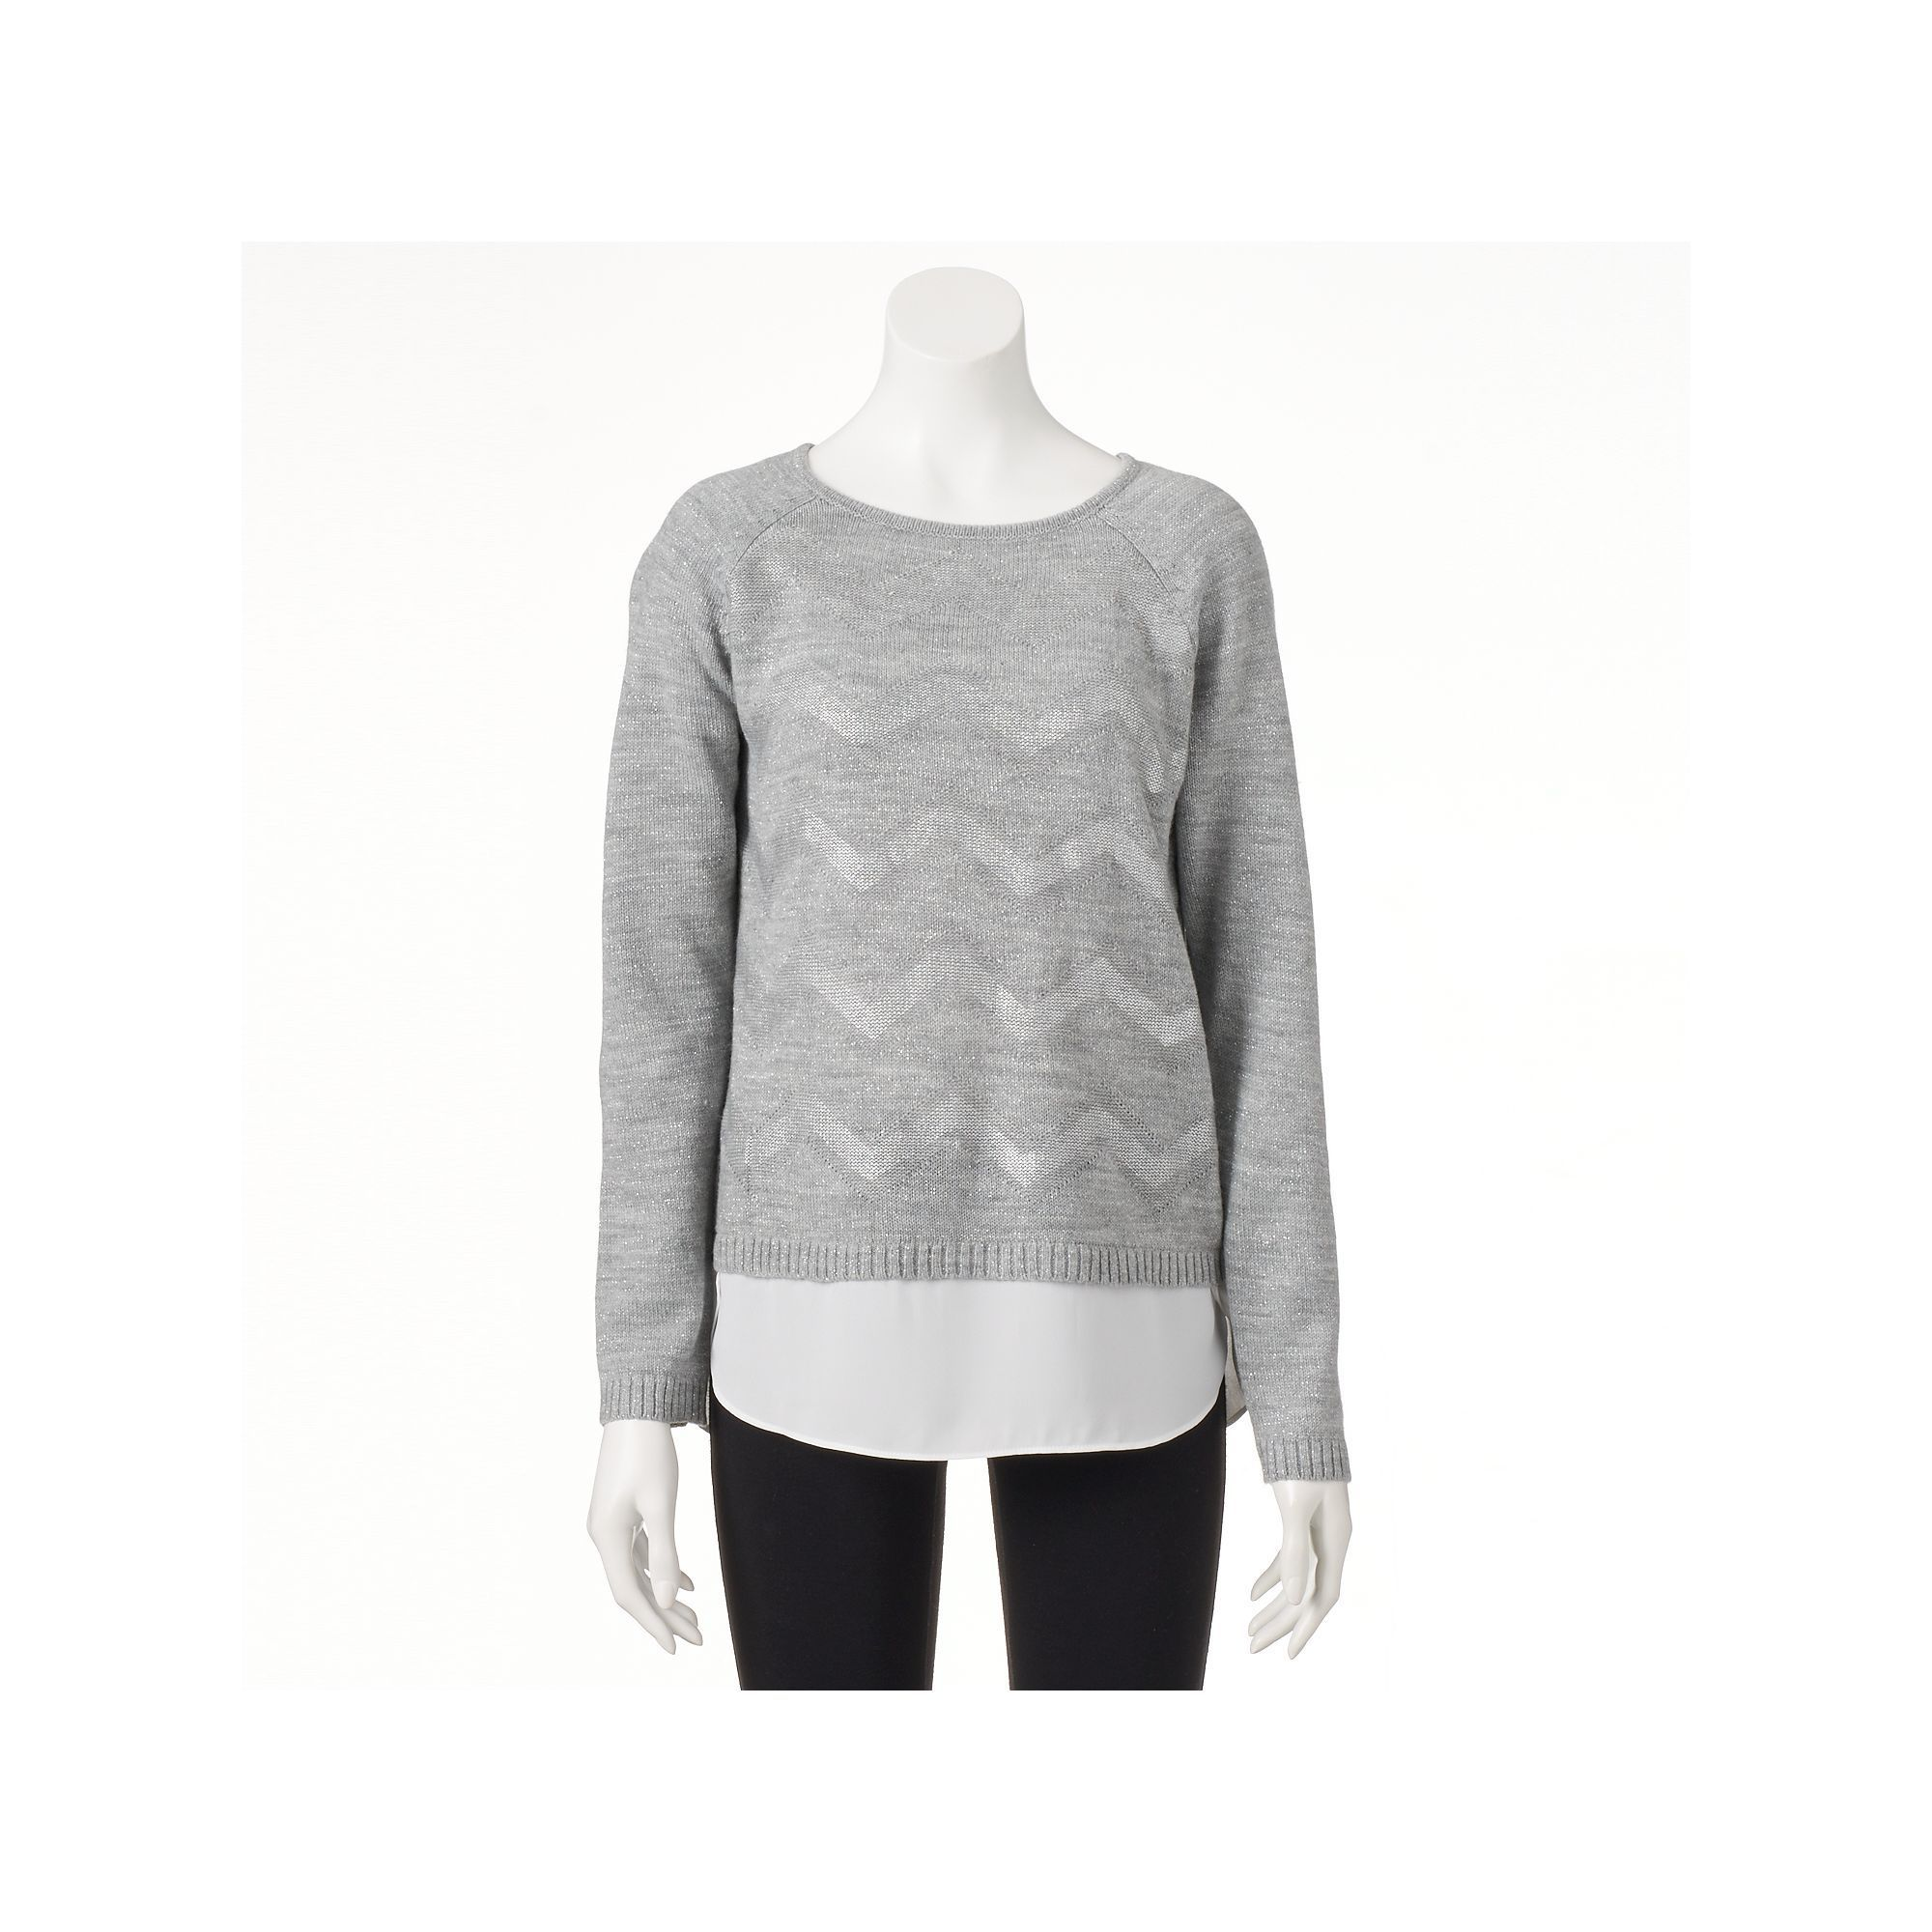 Women's AB Studio Metallic Chevron Sweater, Size: Xlrg Av/Rg, Light Grey